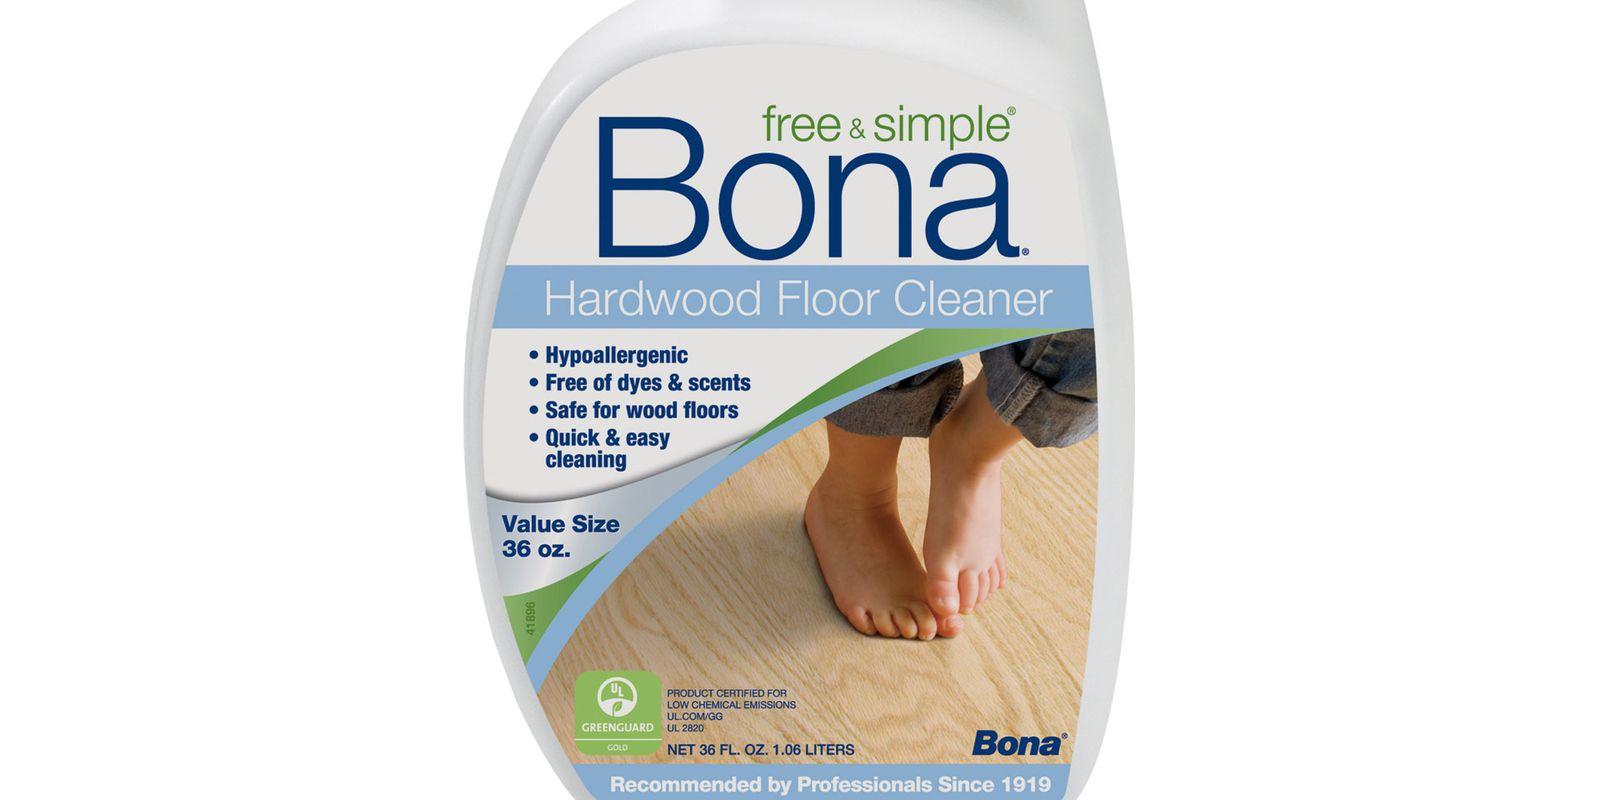 bona free & simple hardwood floor cleaner review